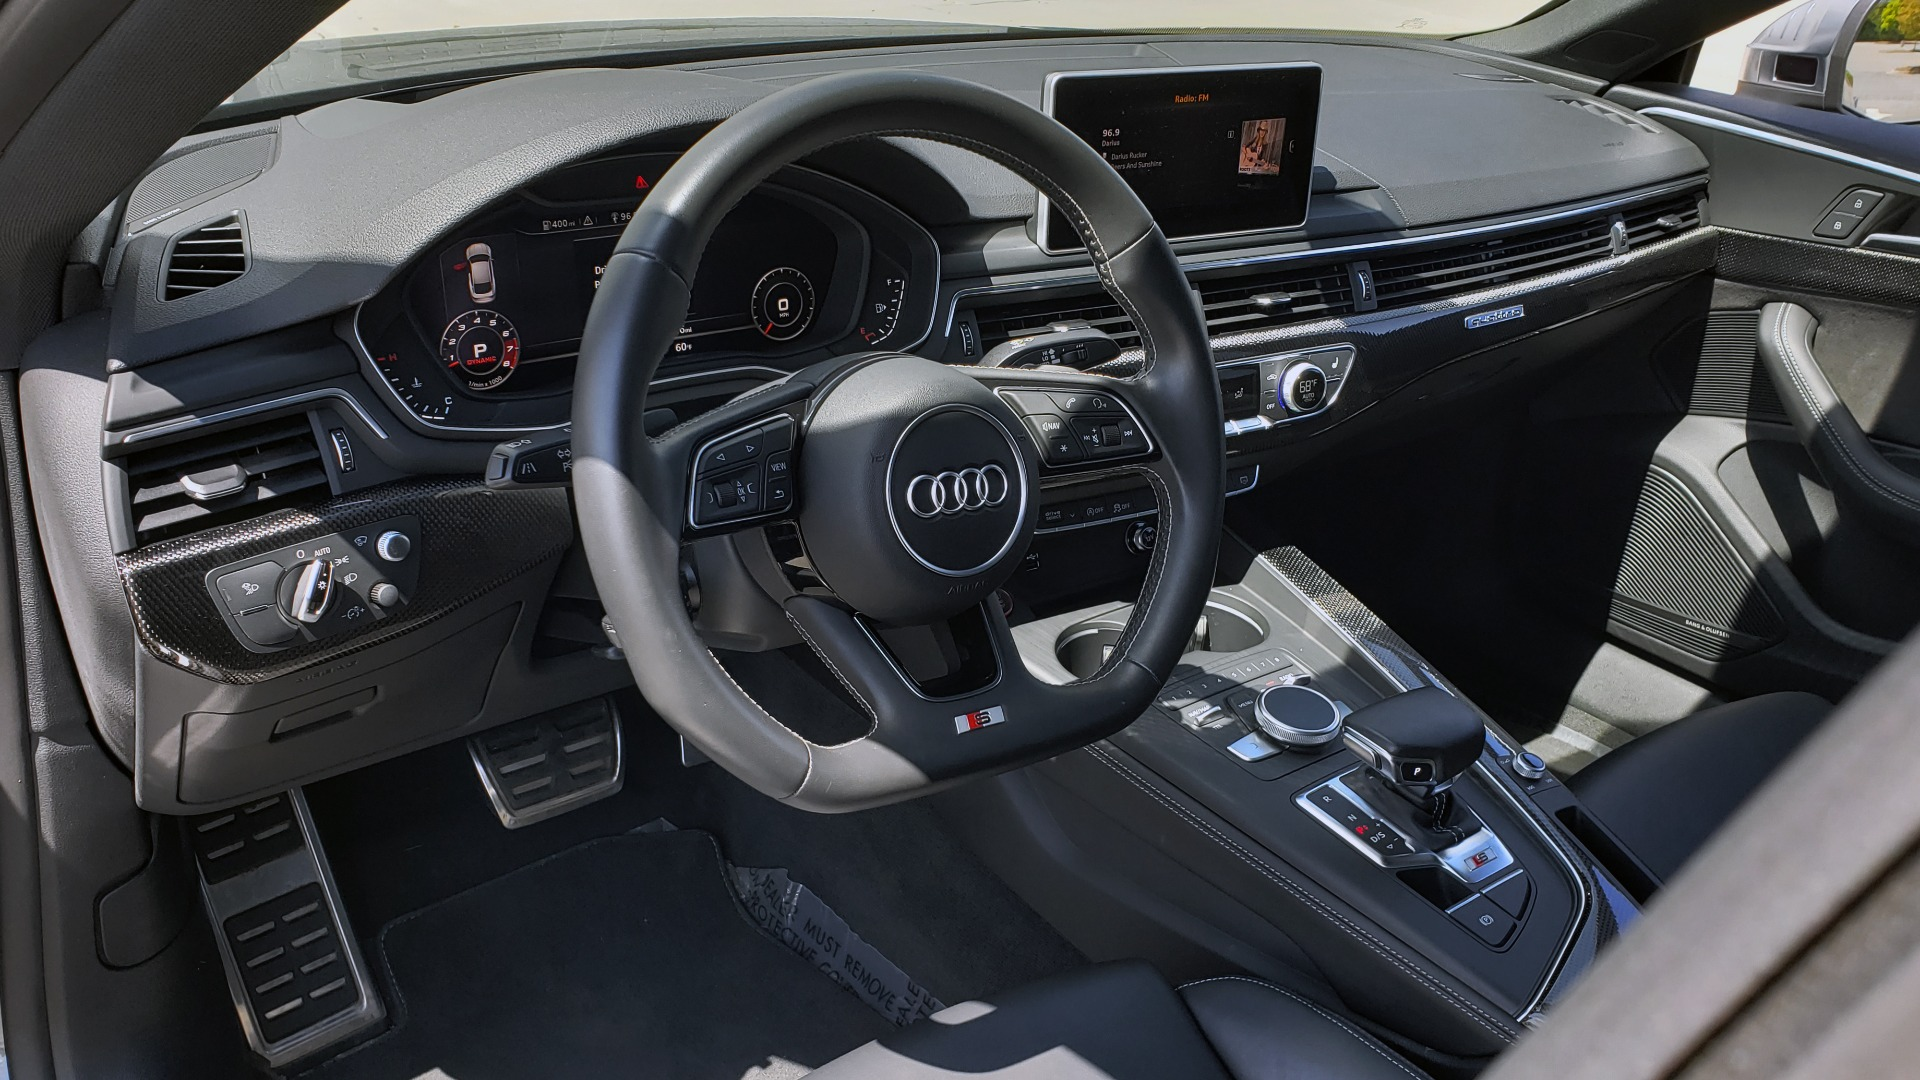 Used 2018 Audi S5 SPORTBACK PRESTIGE S-SPORT / NAV / SUNROOF / HUD / B&O SND / REARVIEW for sale $48,995 at Formula Imports in Charlotte NC 28227 36